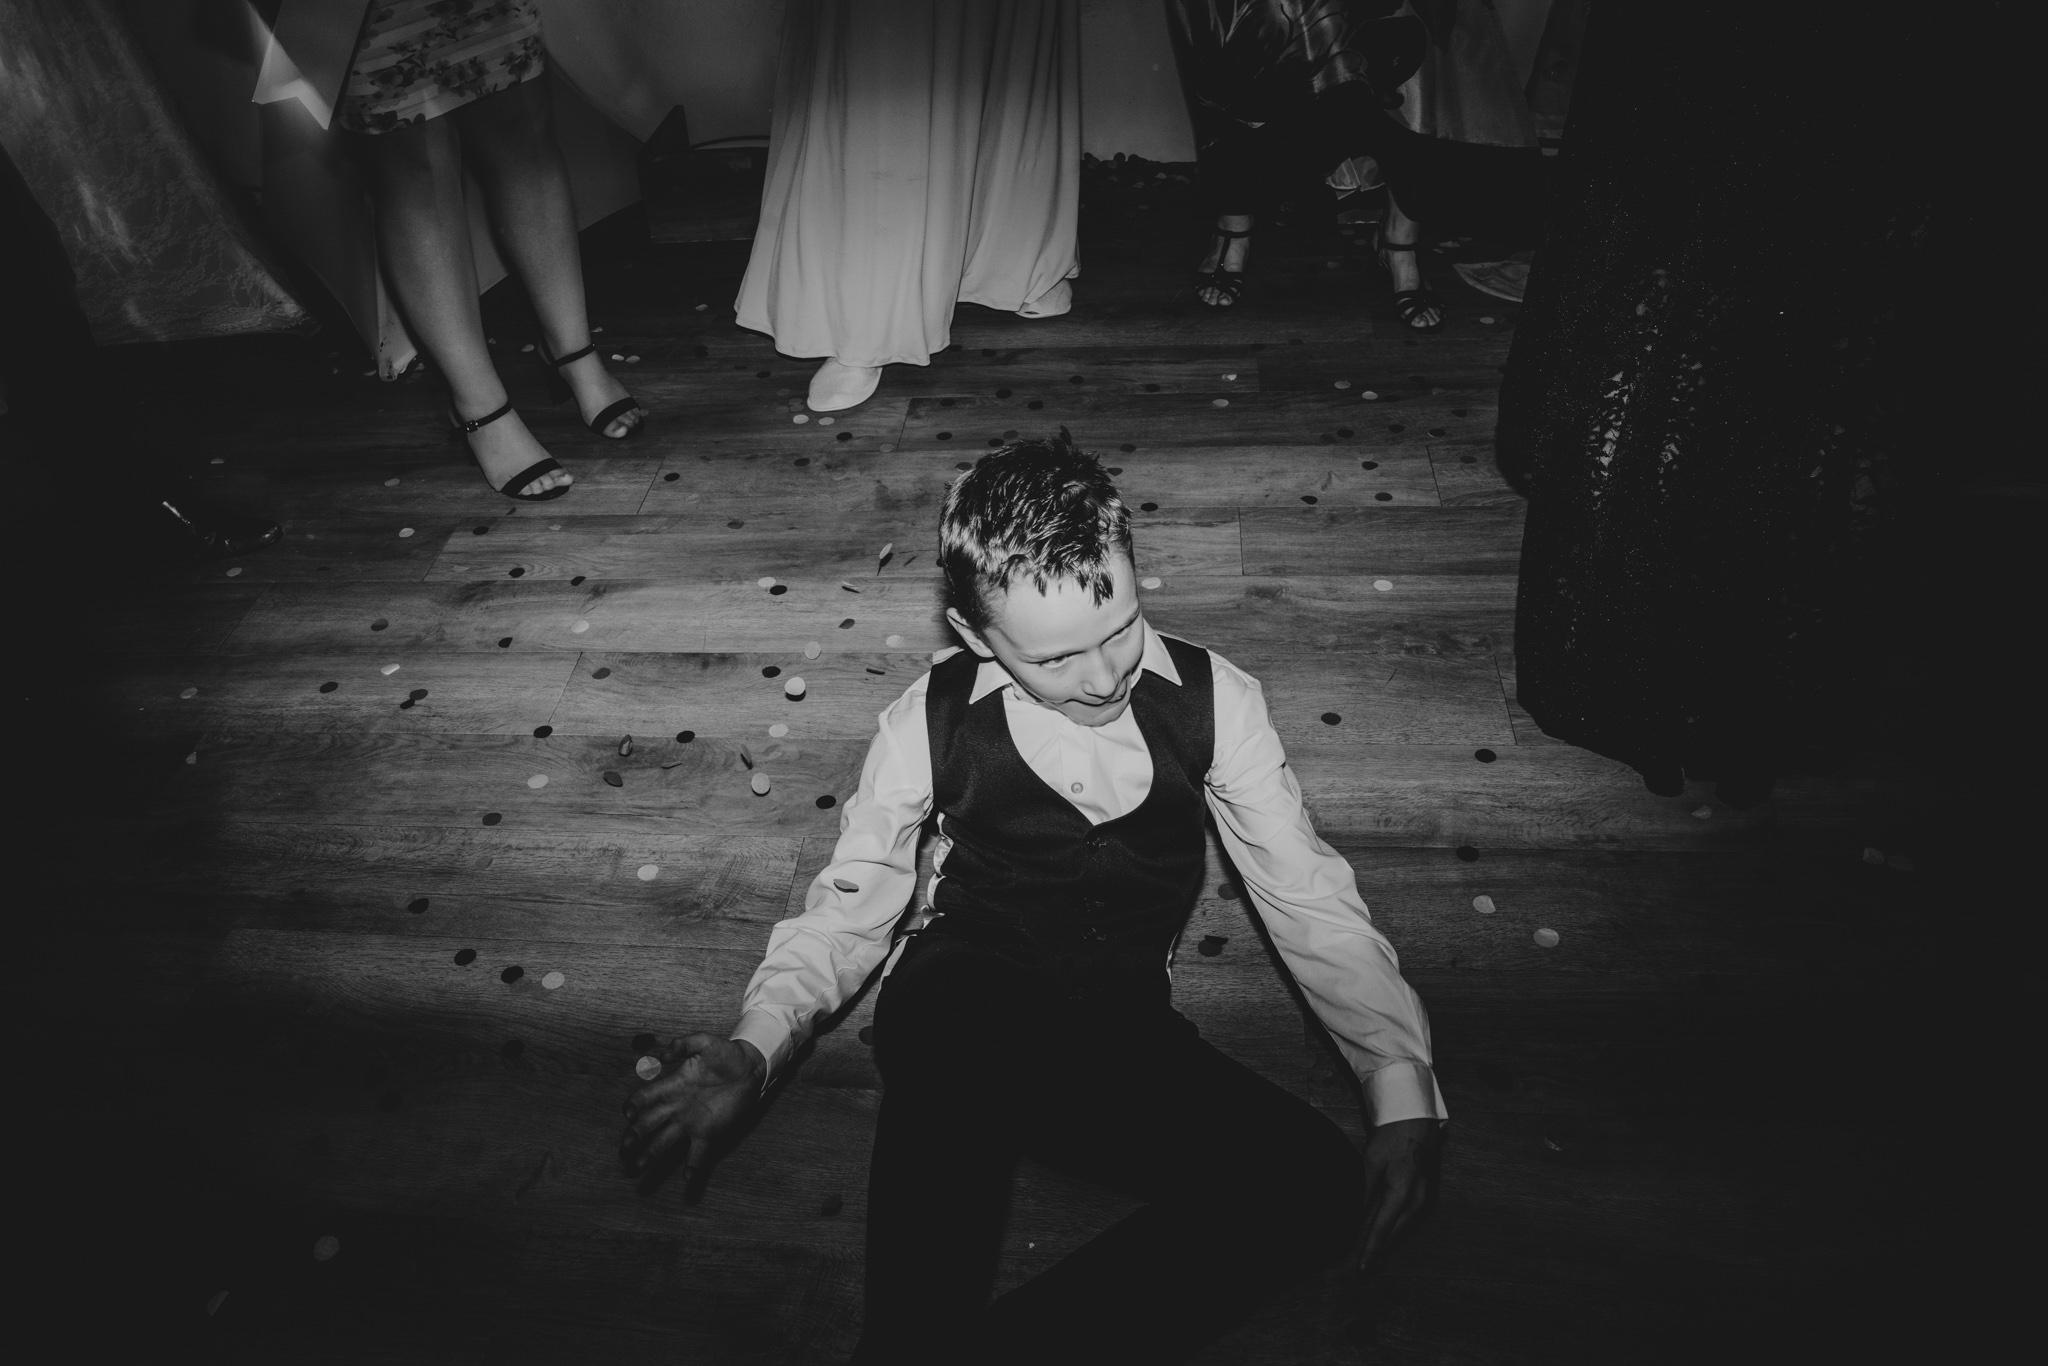 grace-sam-old-barn-clovelly-devon-wedding-photographer-grace-elizabeth-essex-suffolk-norfolk-wedding-photographer (128 of 132).jpg